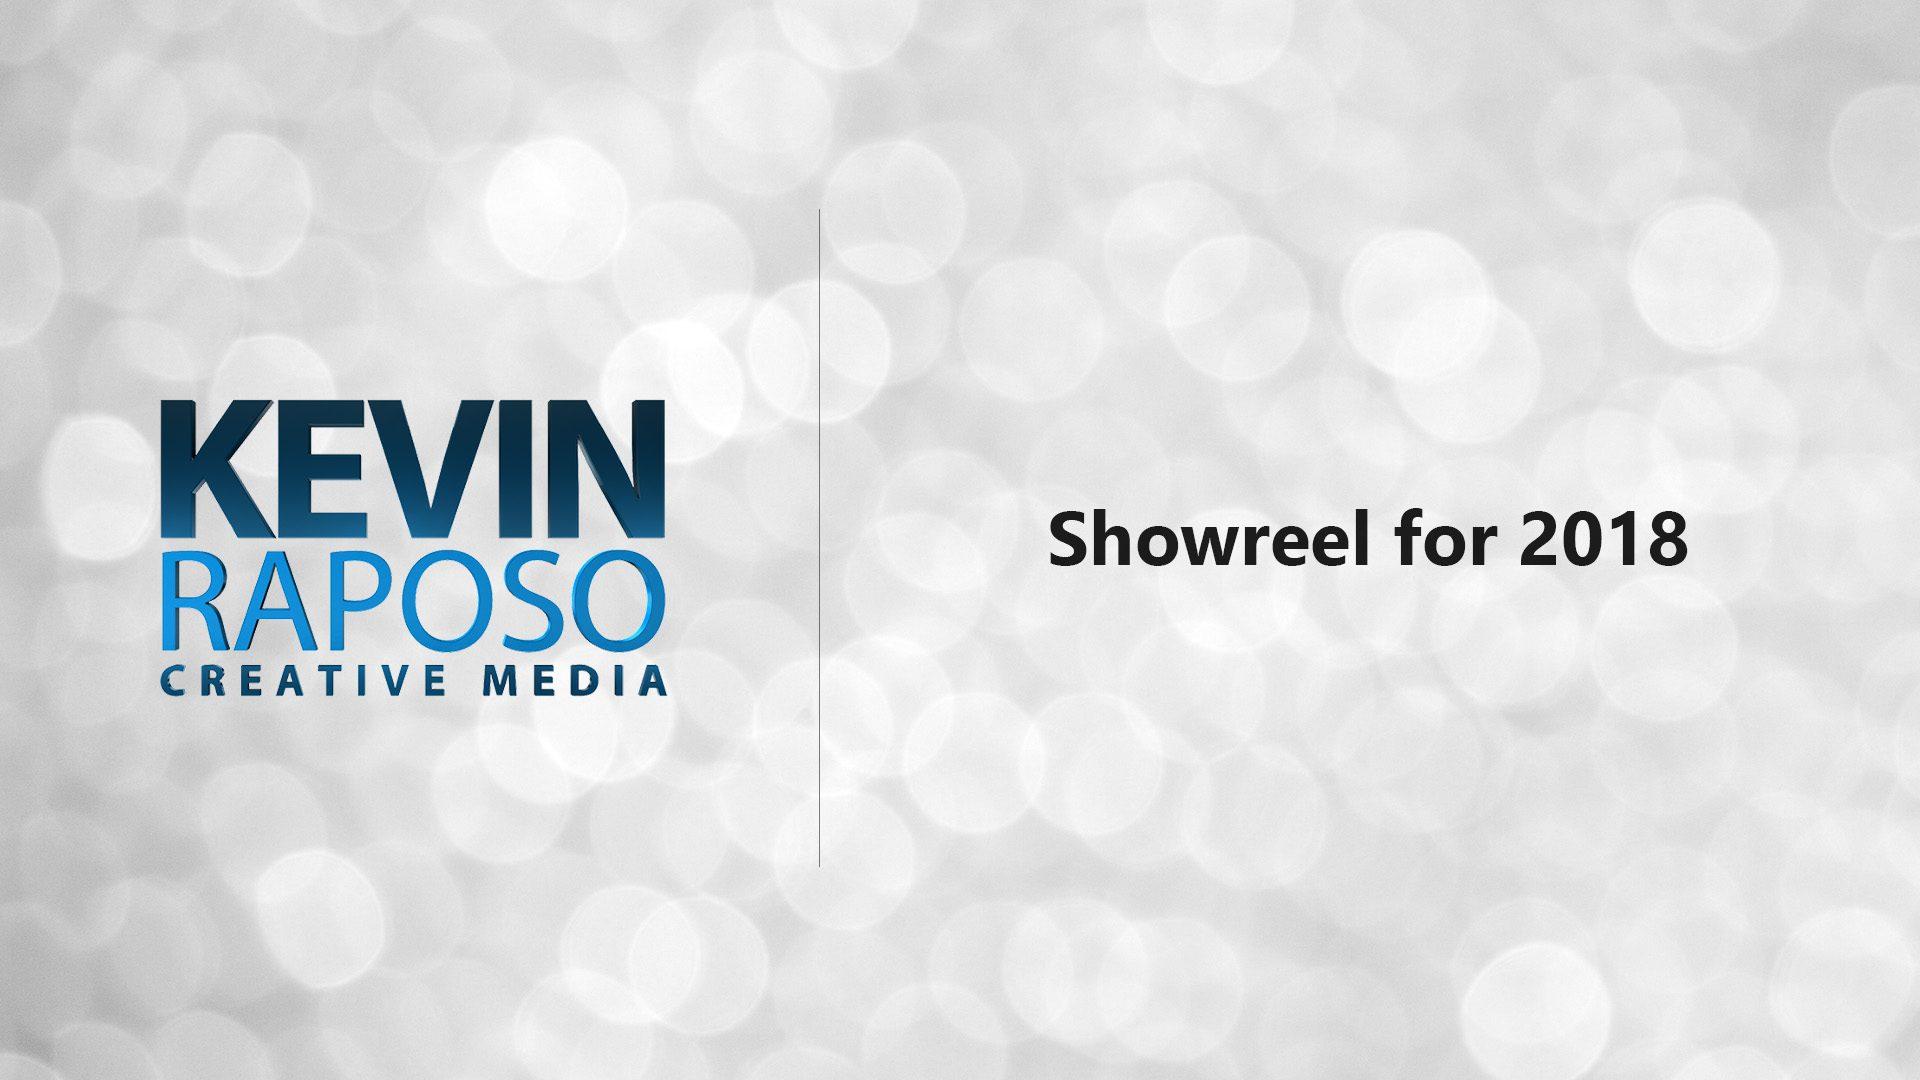 Kevin Raposo · Creative Media - Showreel